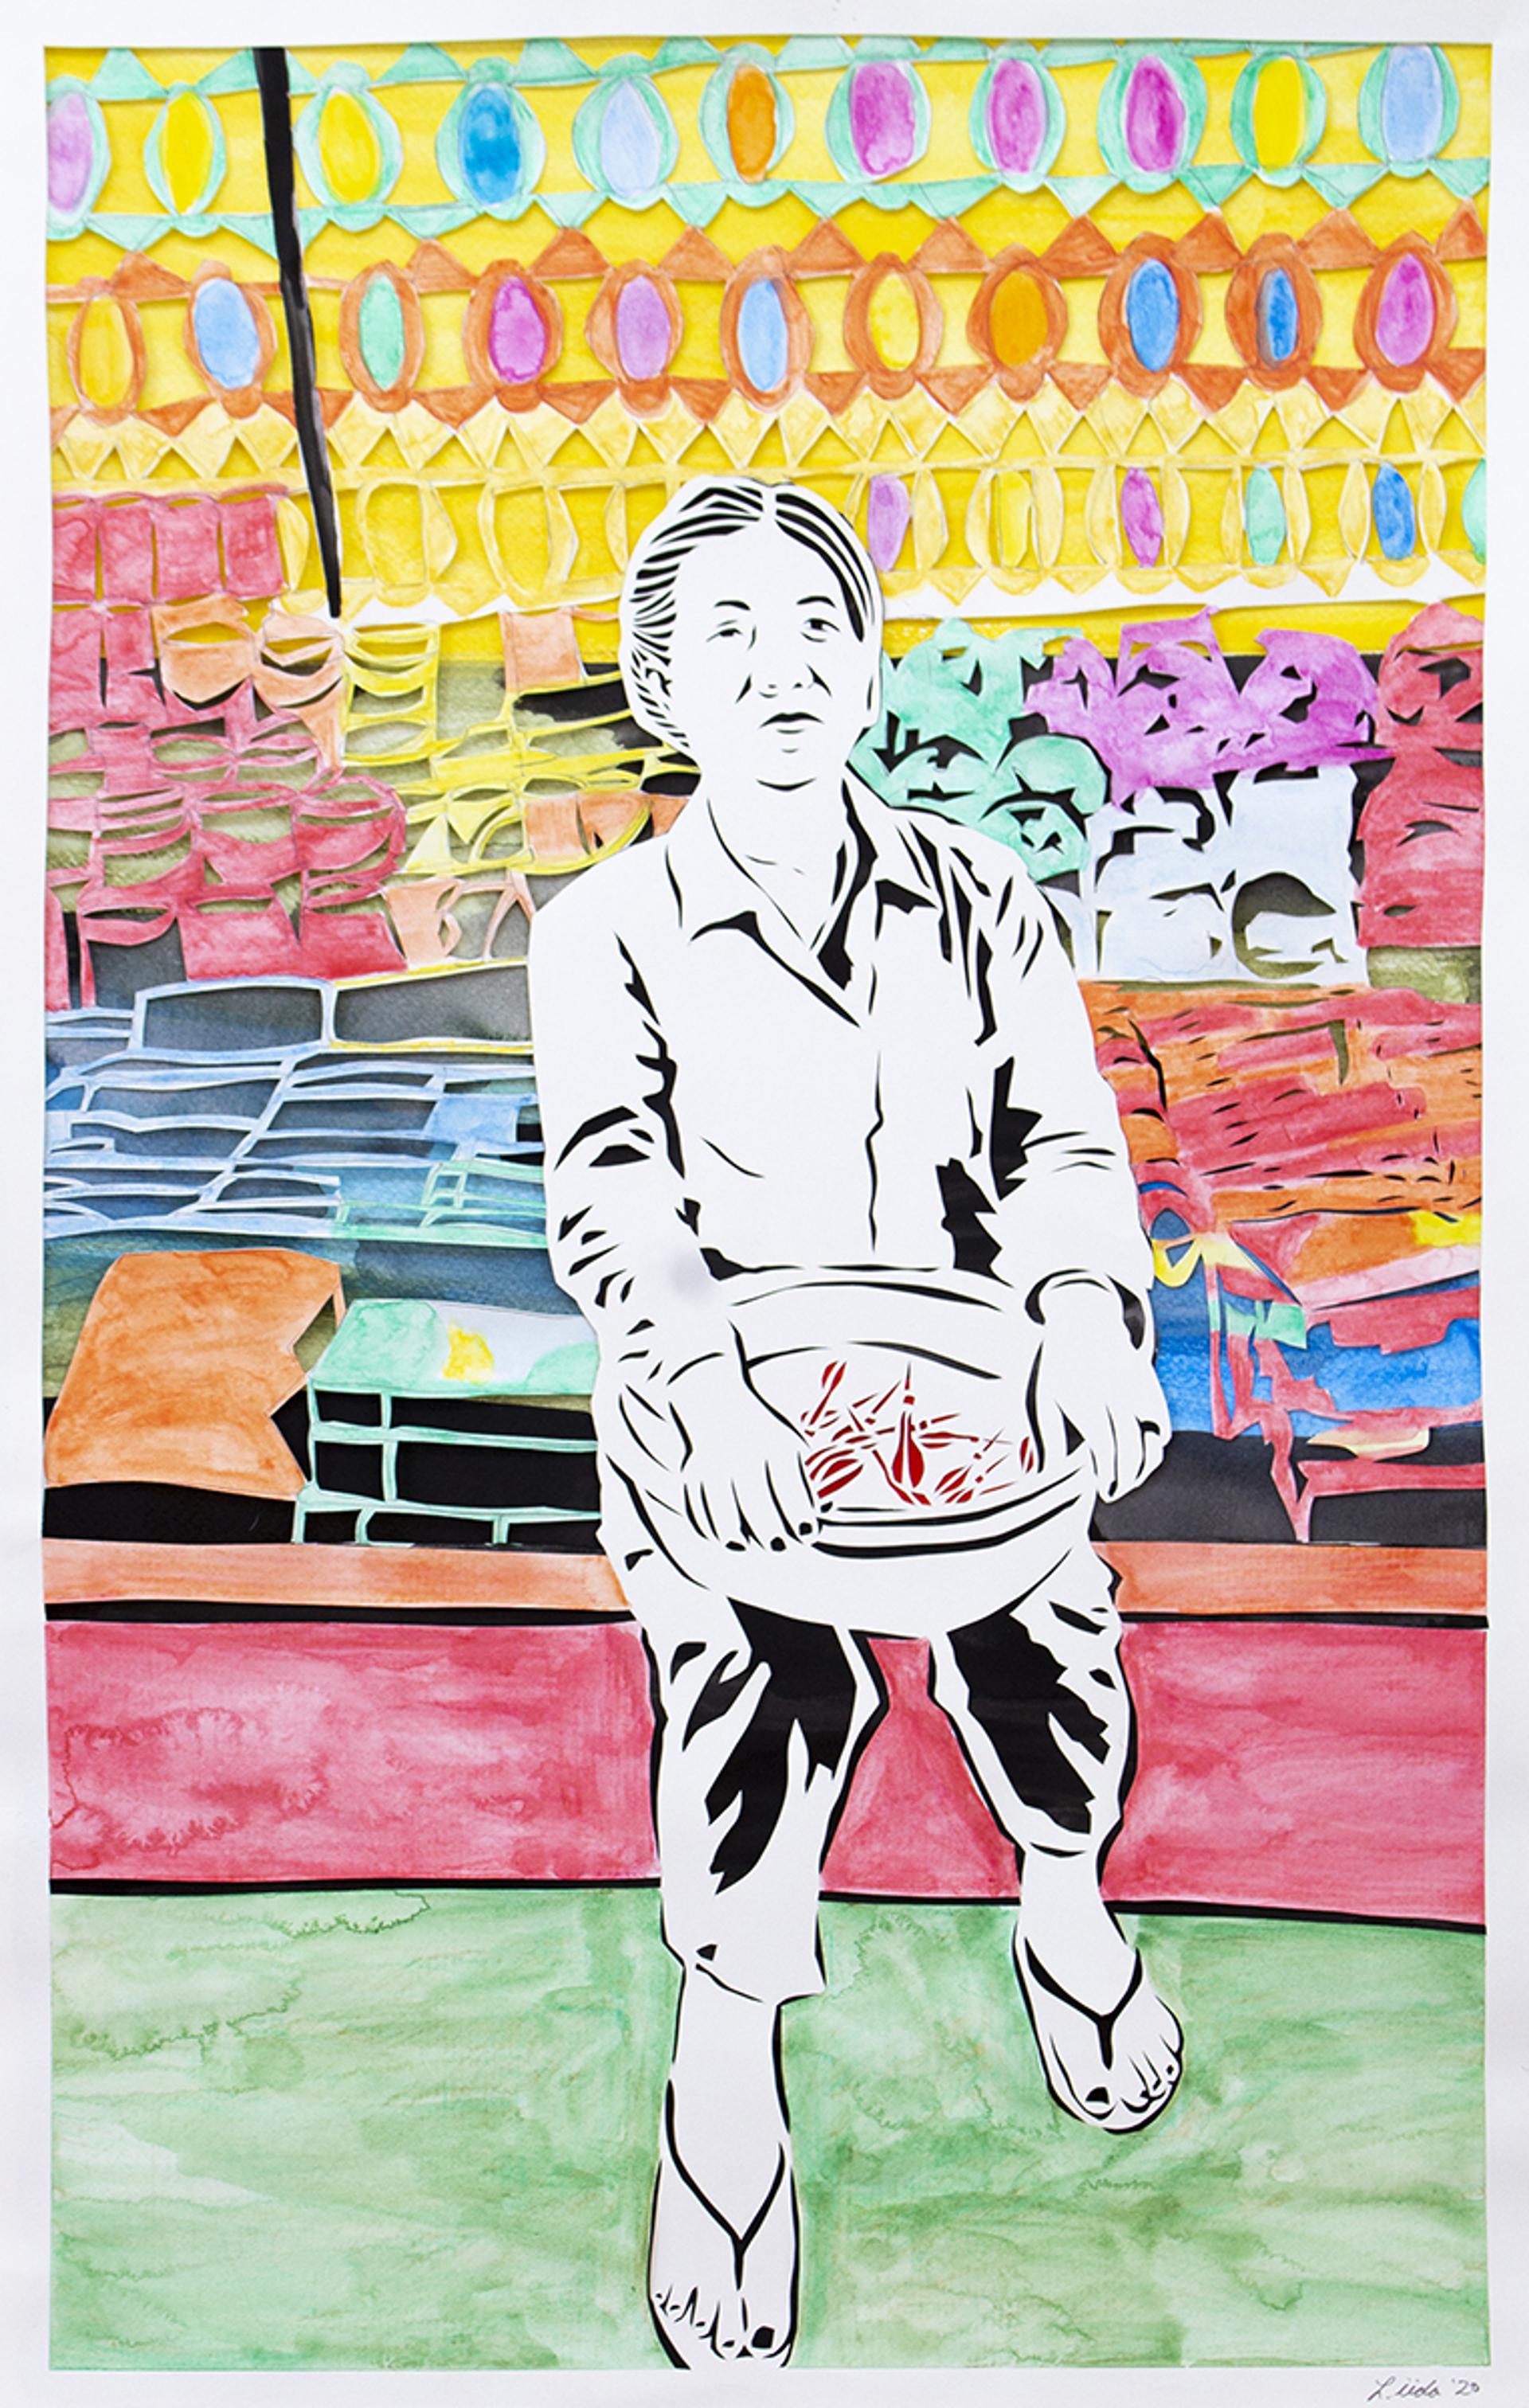 25. Observant: The Appearance of a Night Market Balloon Dart Vendor by Lauren Iida